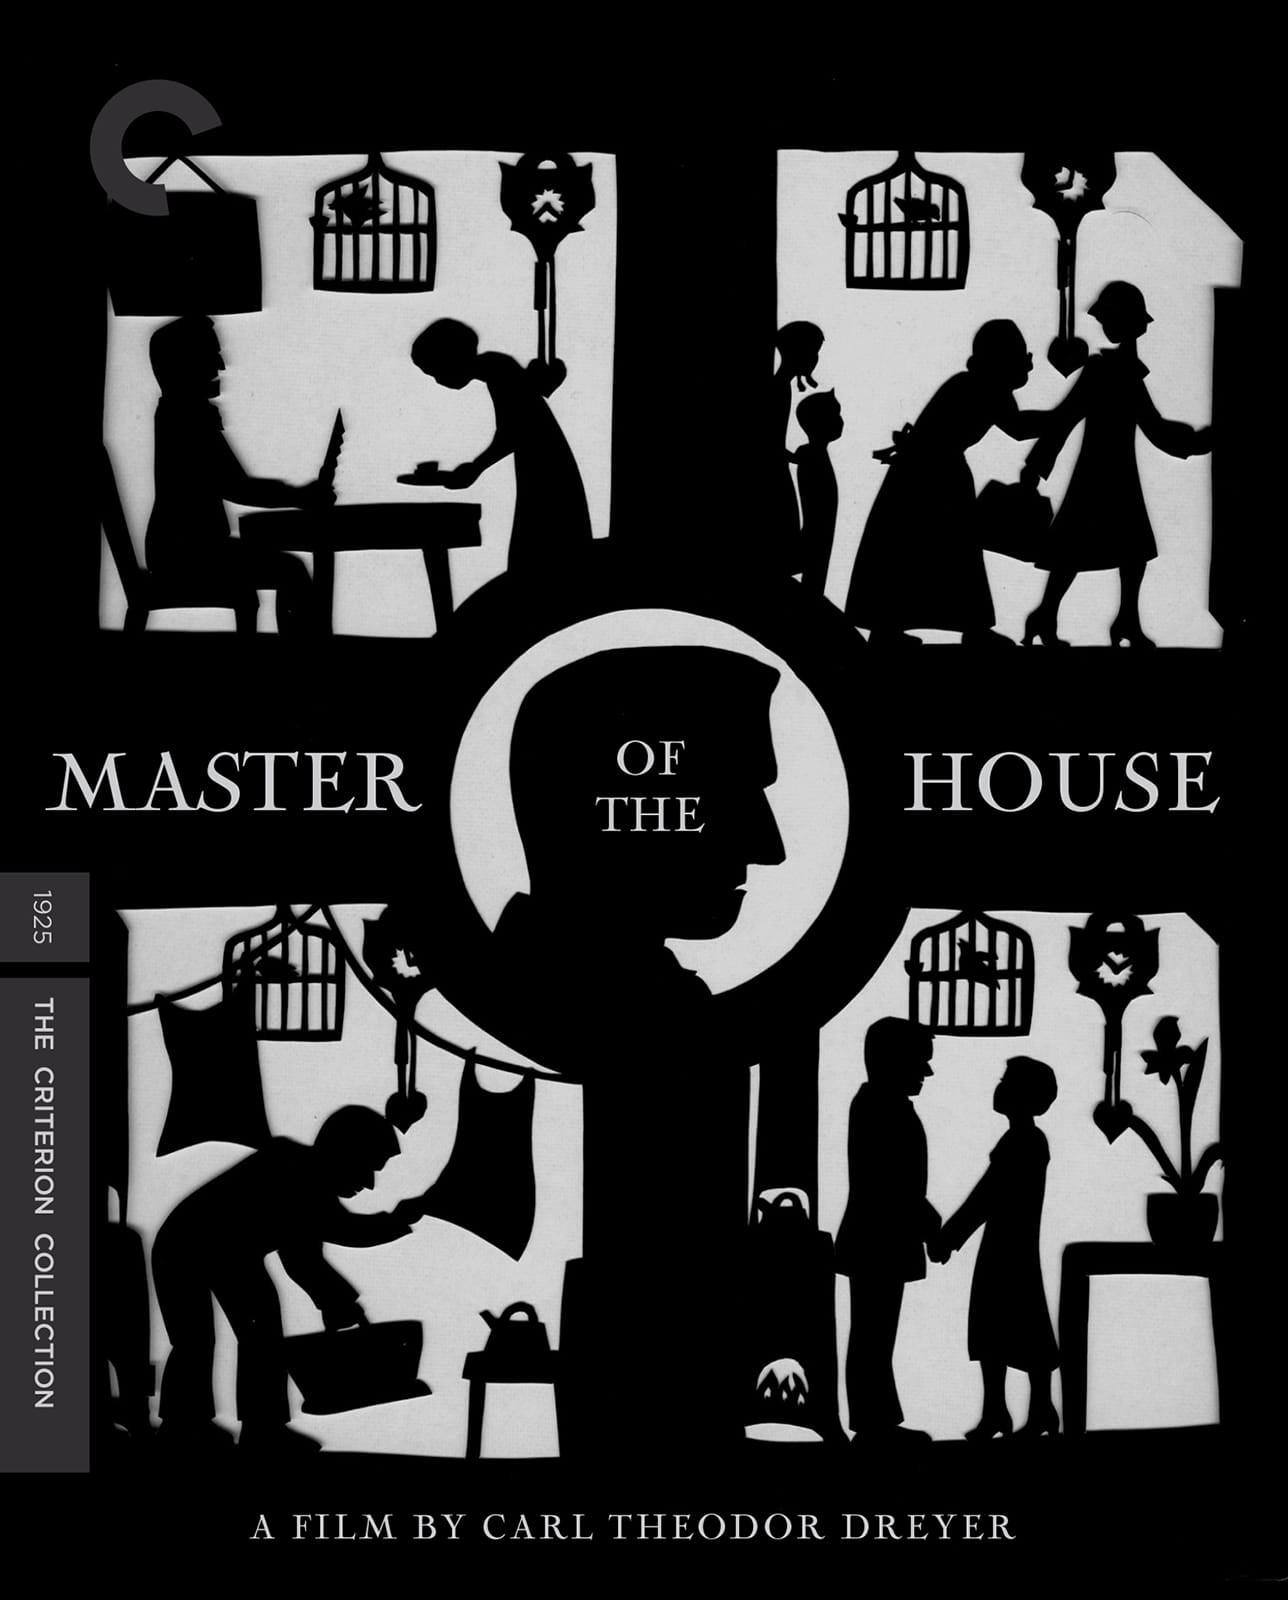 Master of the House (1925) - Directed By: Carl Theodor DreyerStarring: Johannes Meyer, Astrid Holm, Karin Nellemose, Mathilde NielsenRated: GRun Time: 1h 51mTMM Score: 4Strengths: Progressive MessageWeakness: Very Basic Story